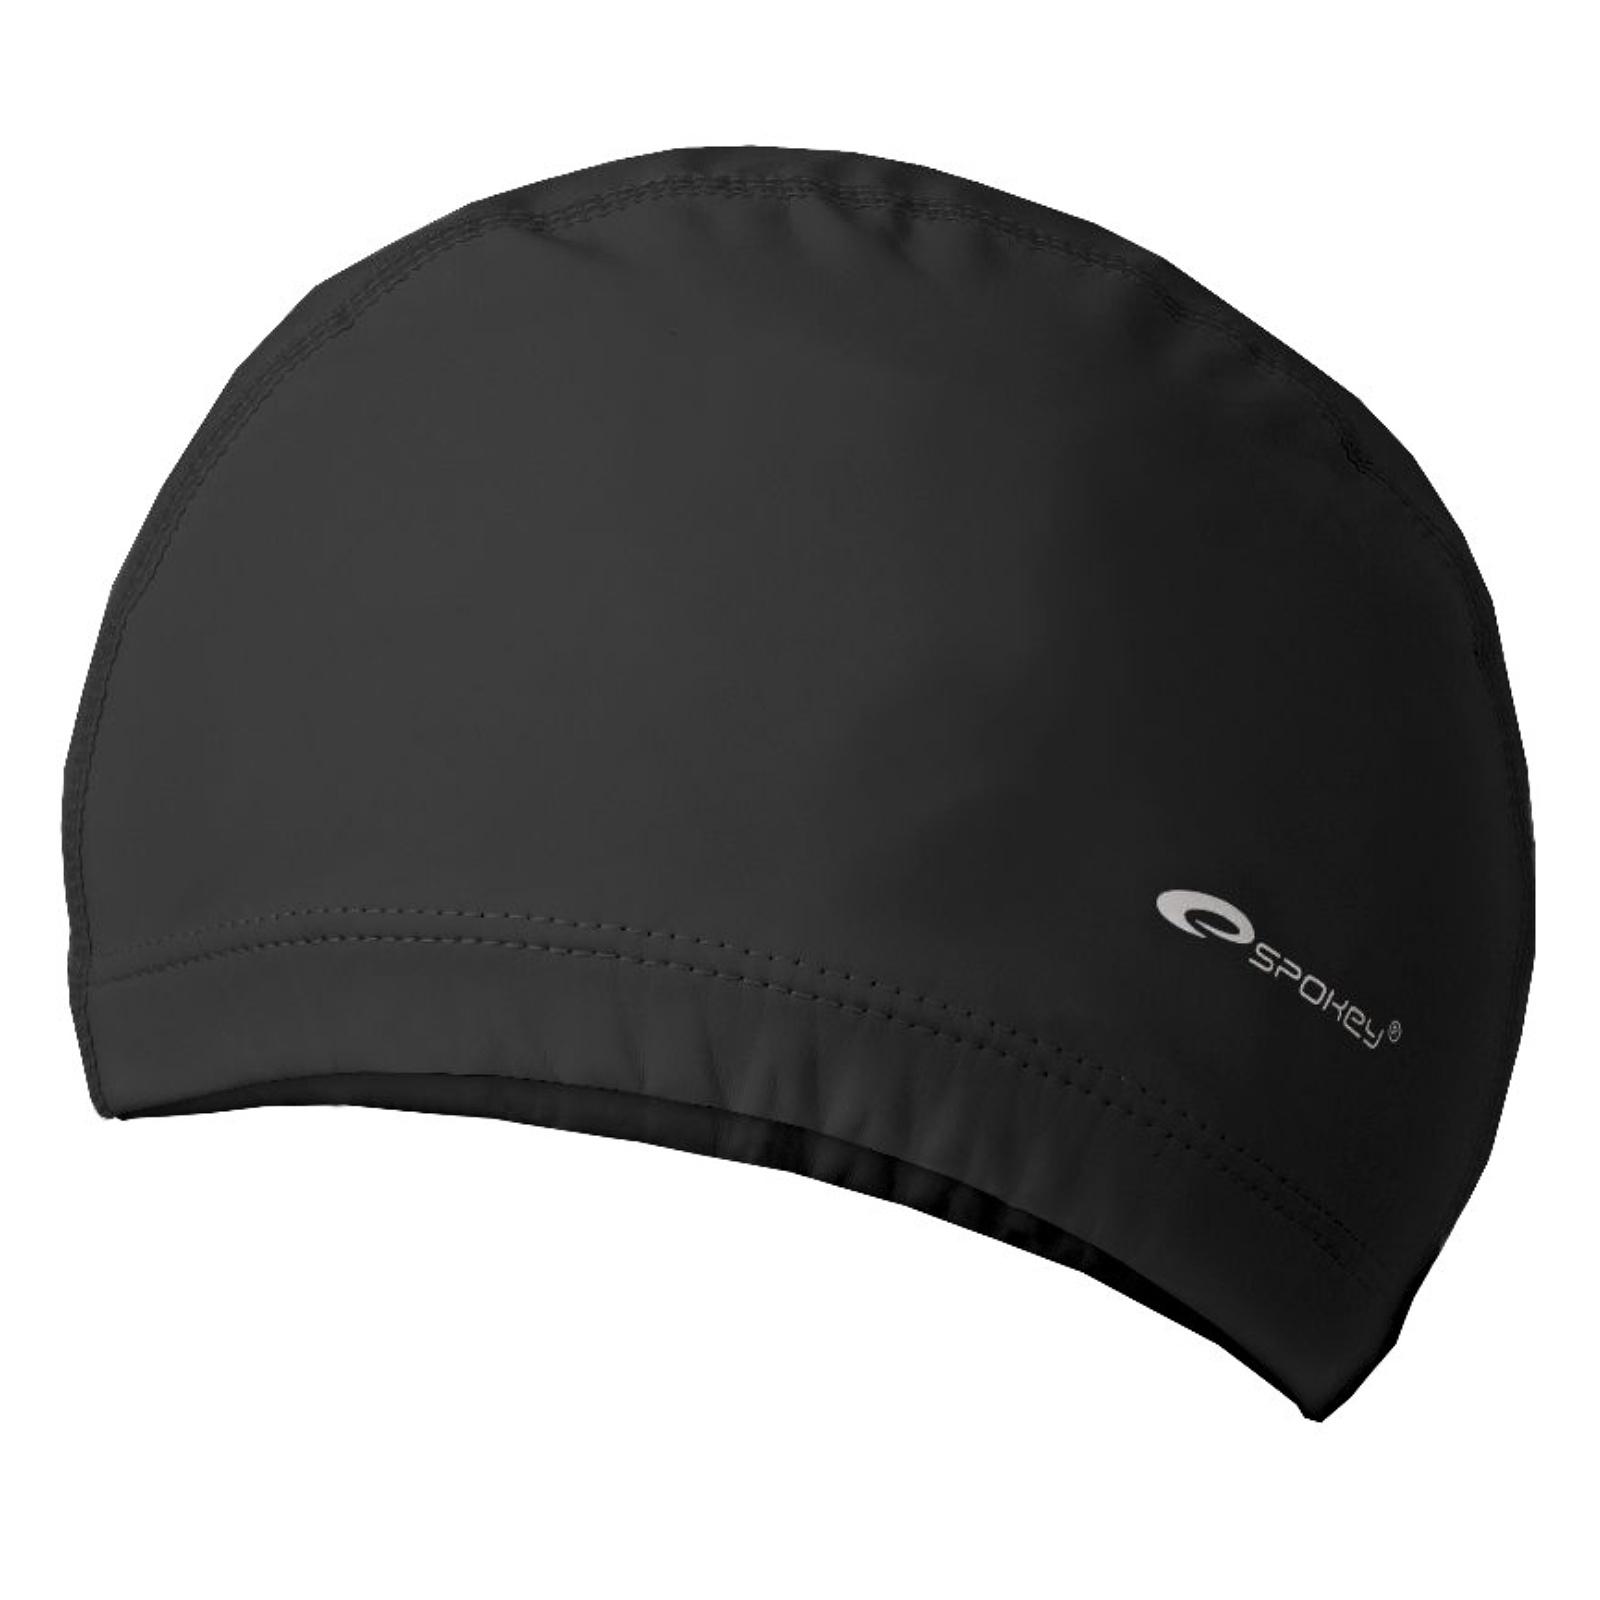 Plavecká čepice SPOKEY Torpedo - černá